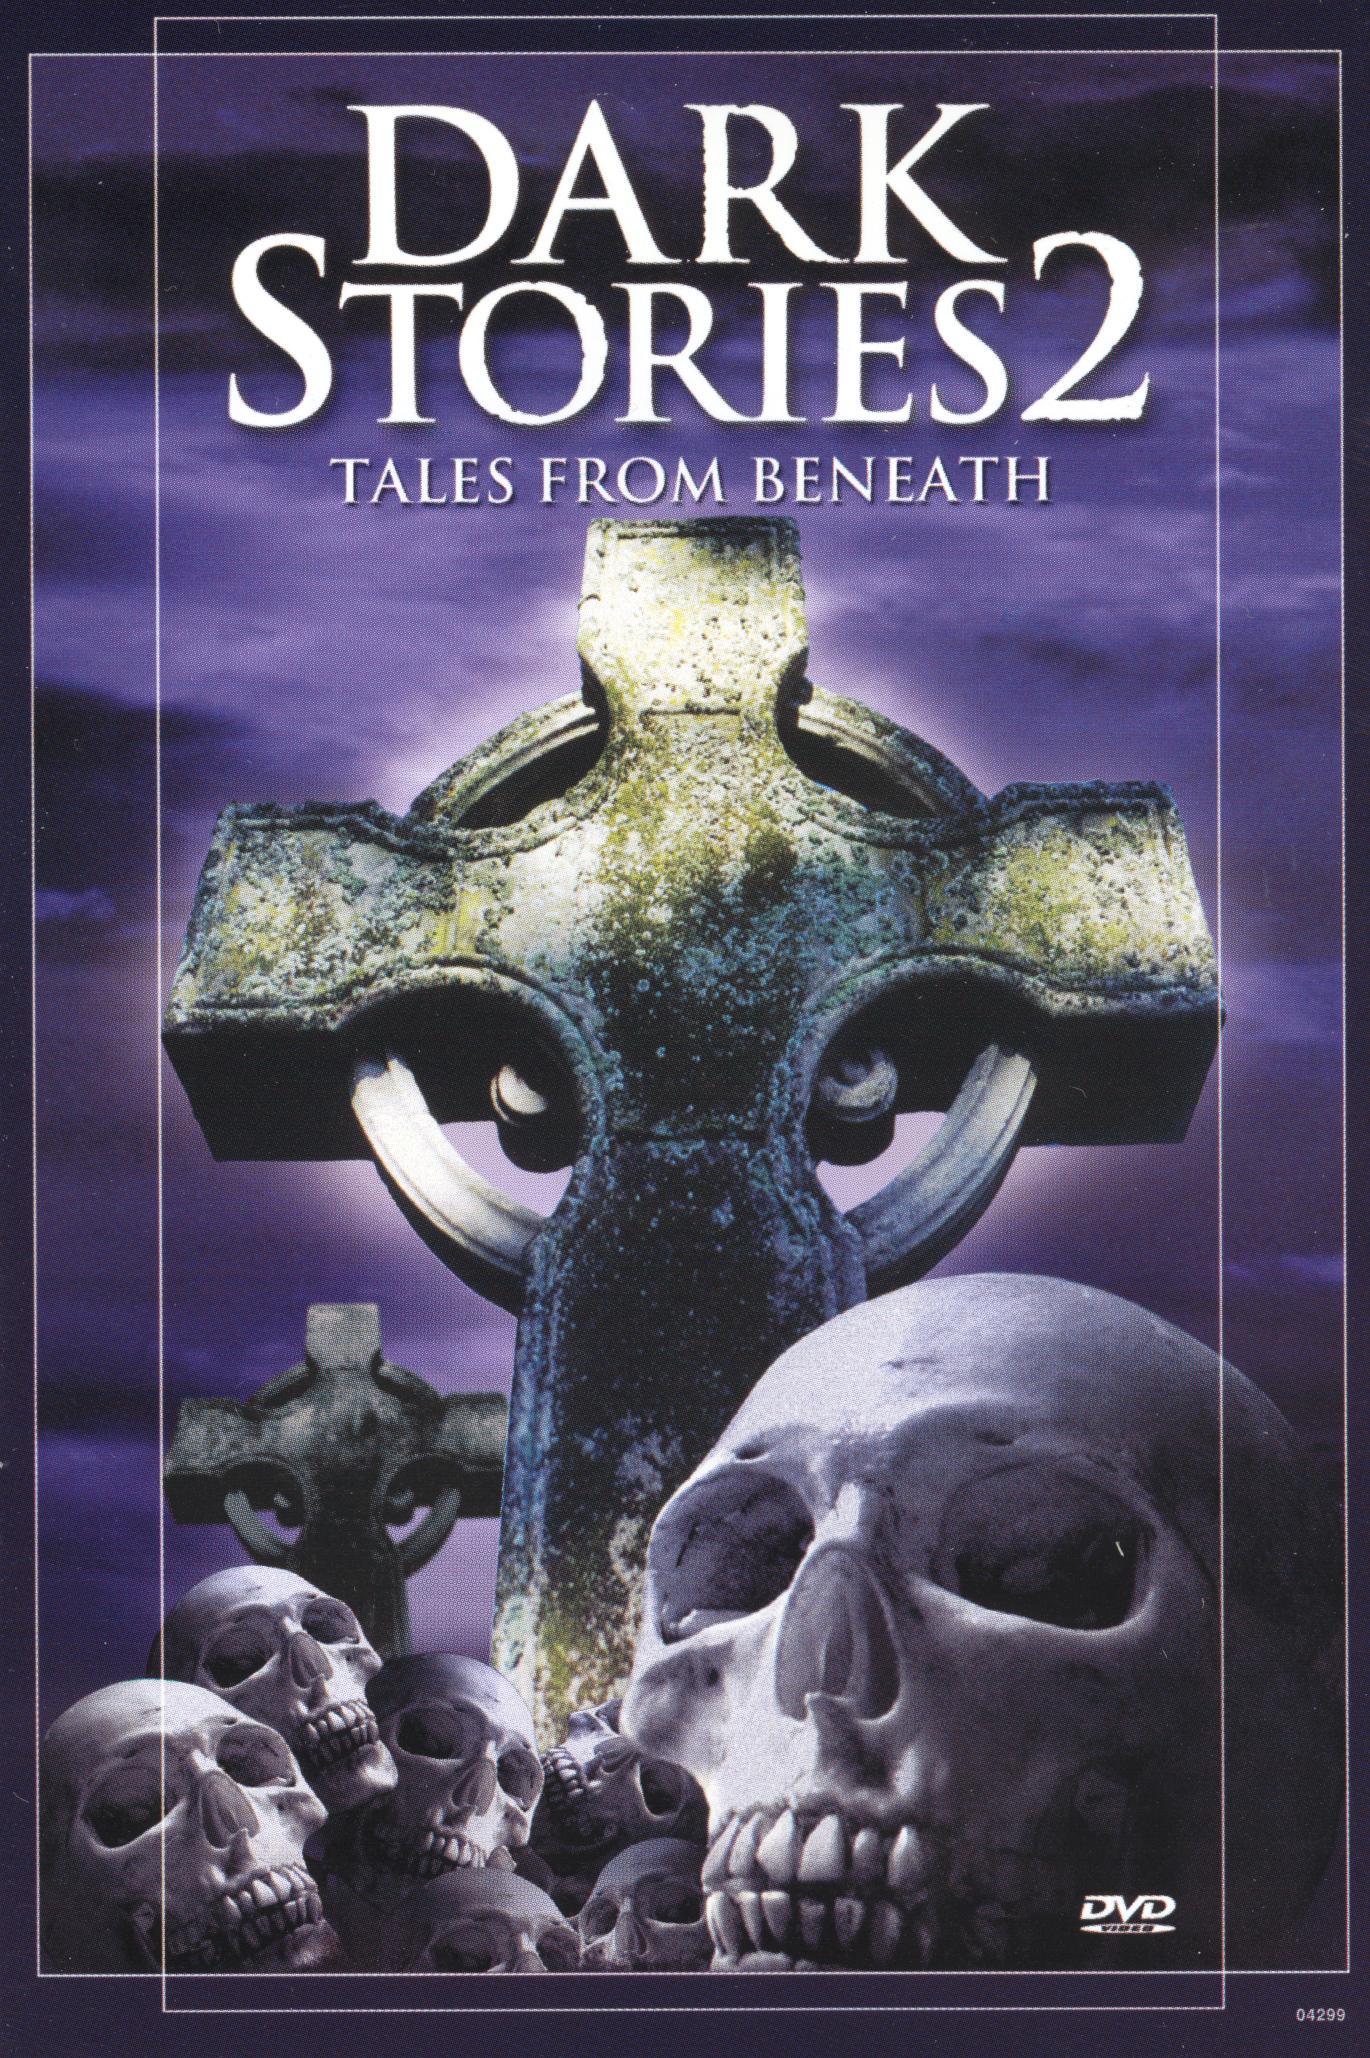 Dark Stories 2: Tales From Beneath